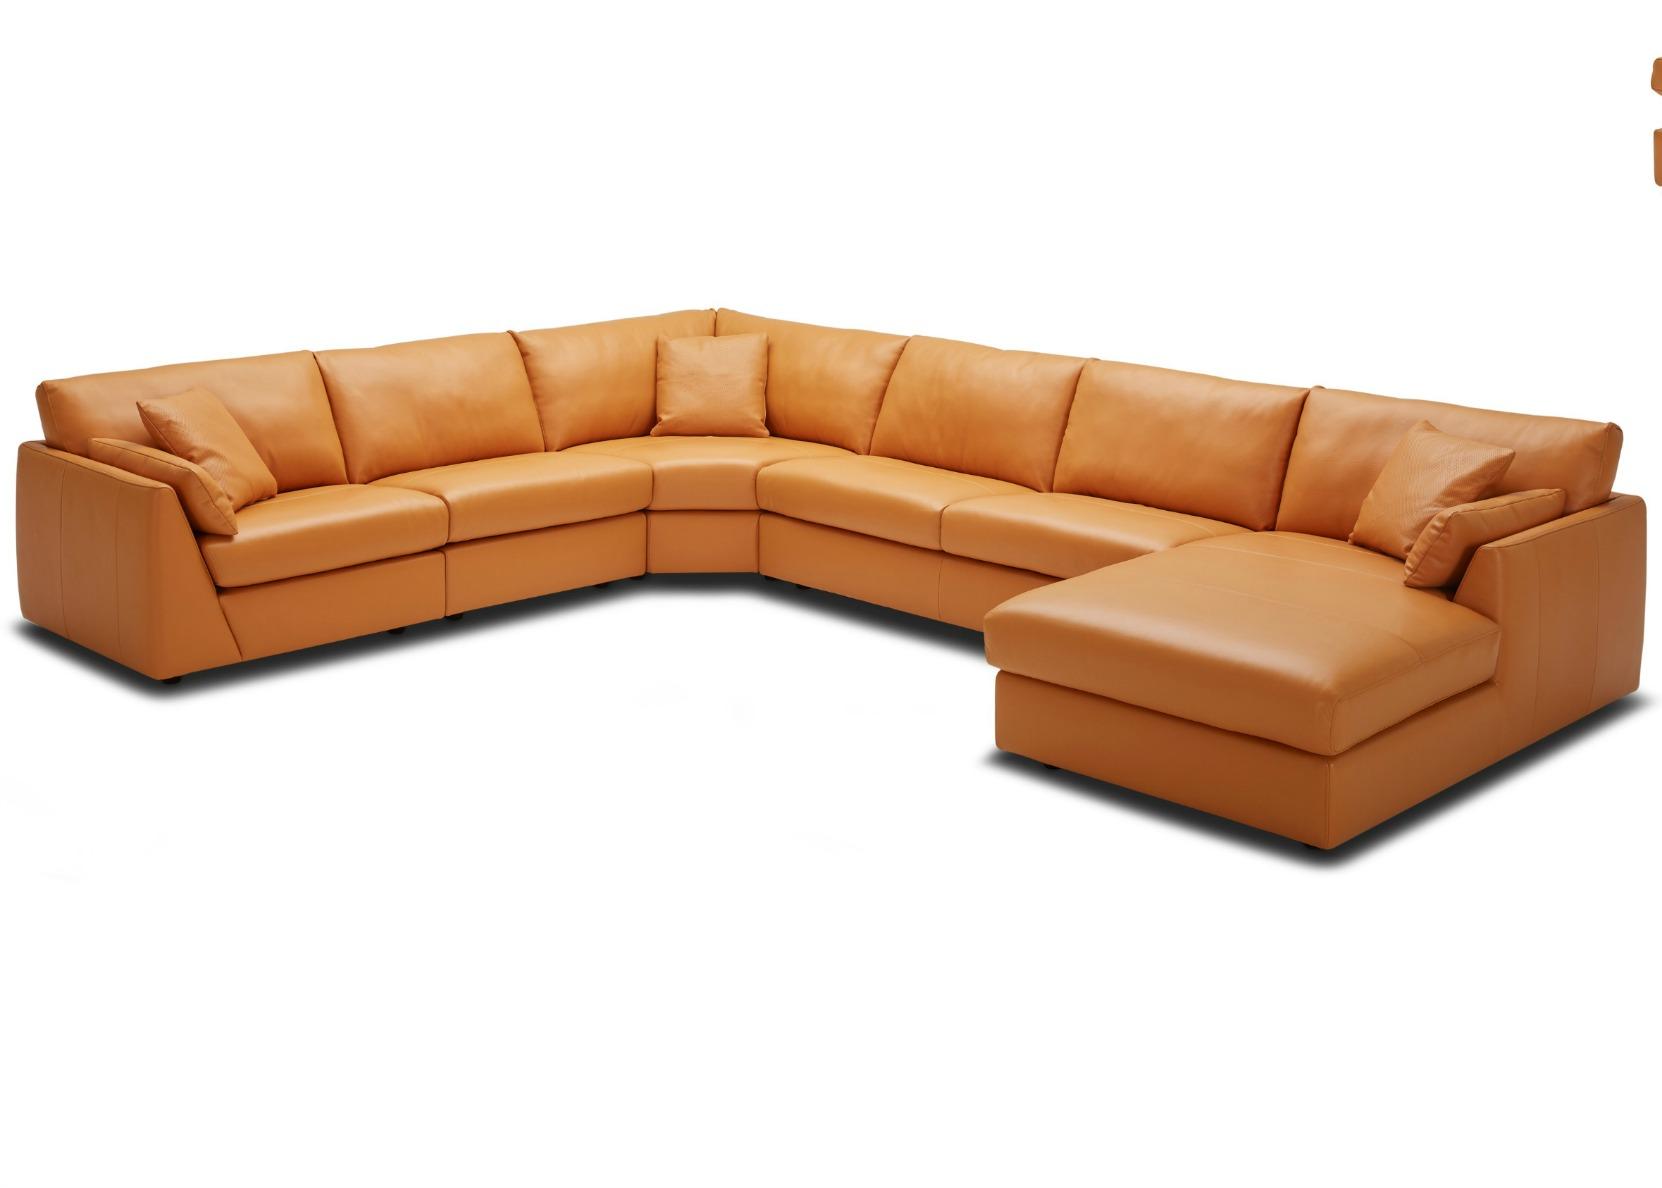 Tan Leather Chaise Sofa